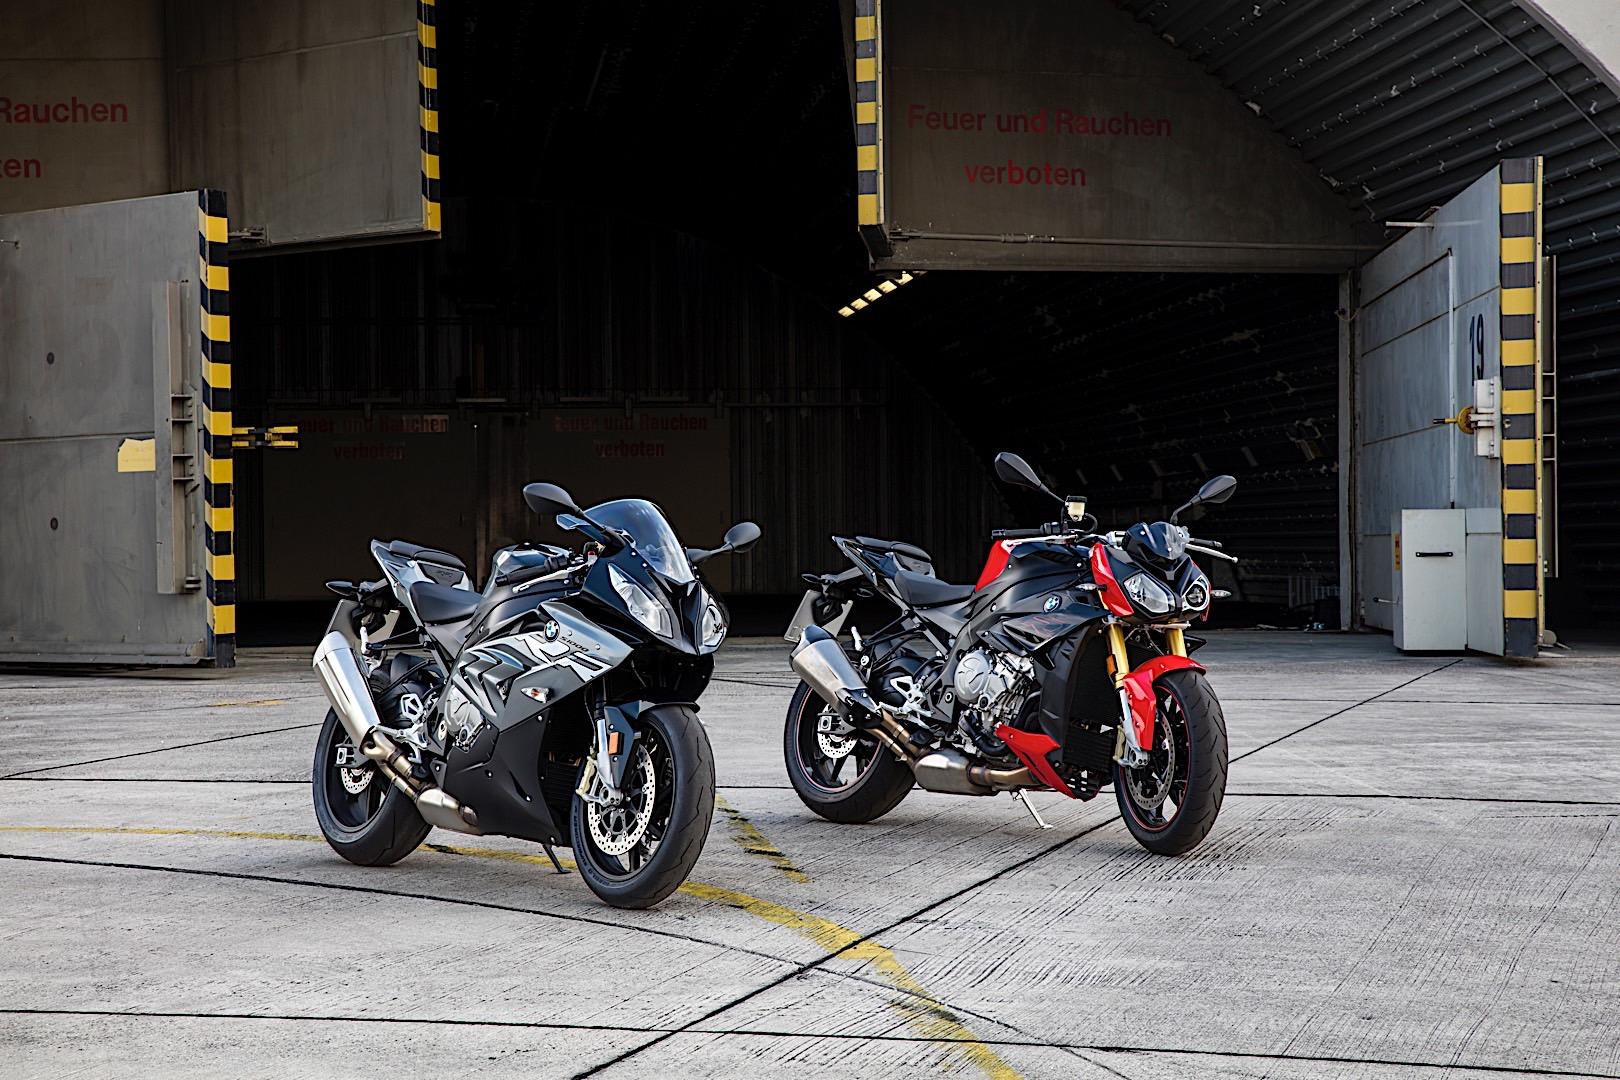 Suzuki Car Dealership >> BMW Motorrad Recalls S1000R and S1000RR Over Suspension Issue - autoevolution